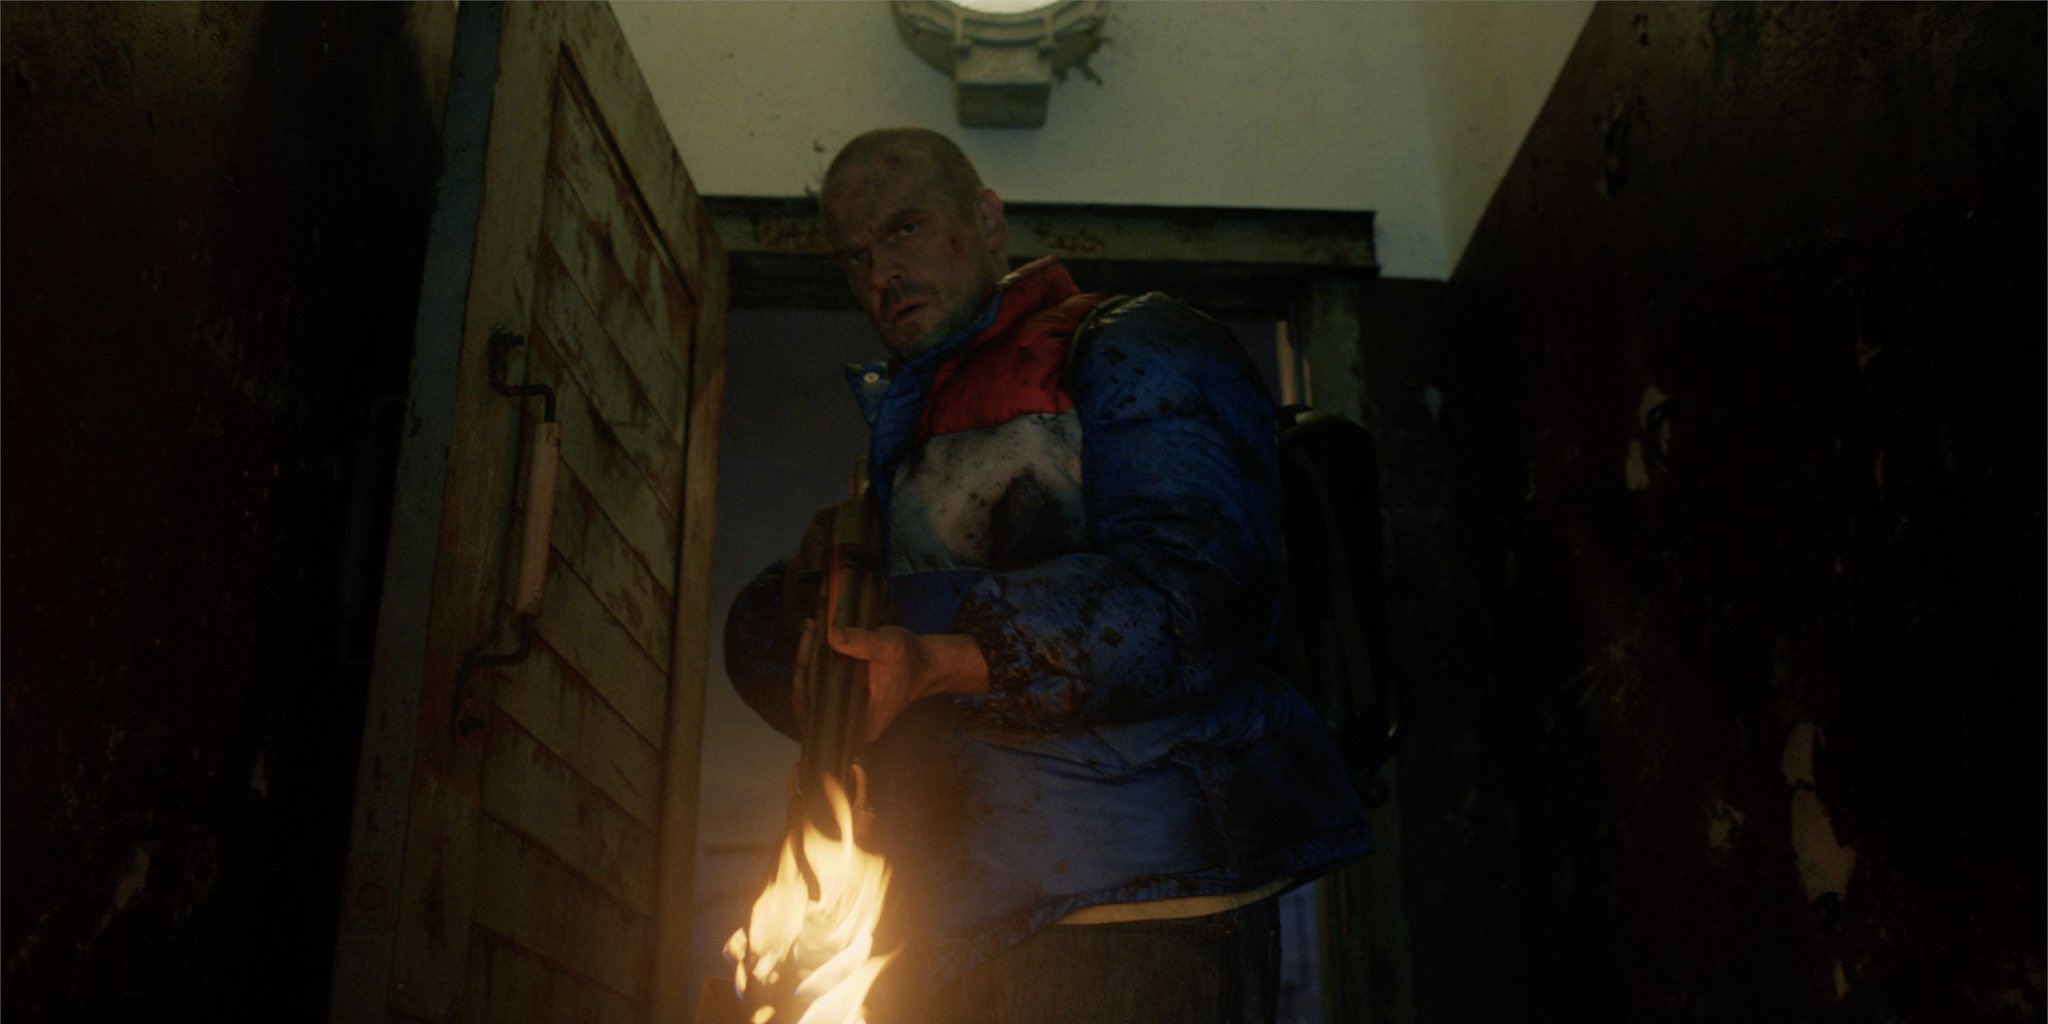 Foto de Netflix: La cuarta parte de Stranger Things ya tiene fecha de estreno